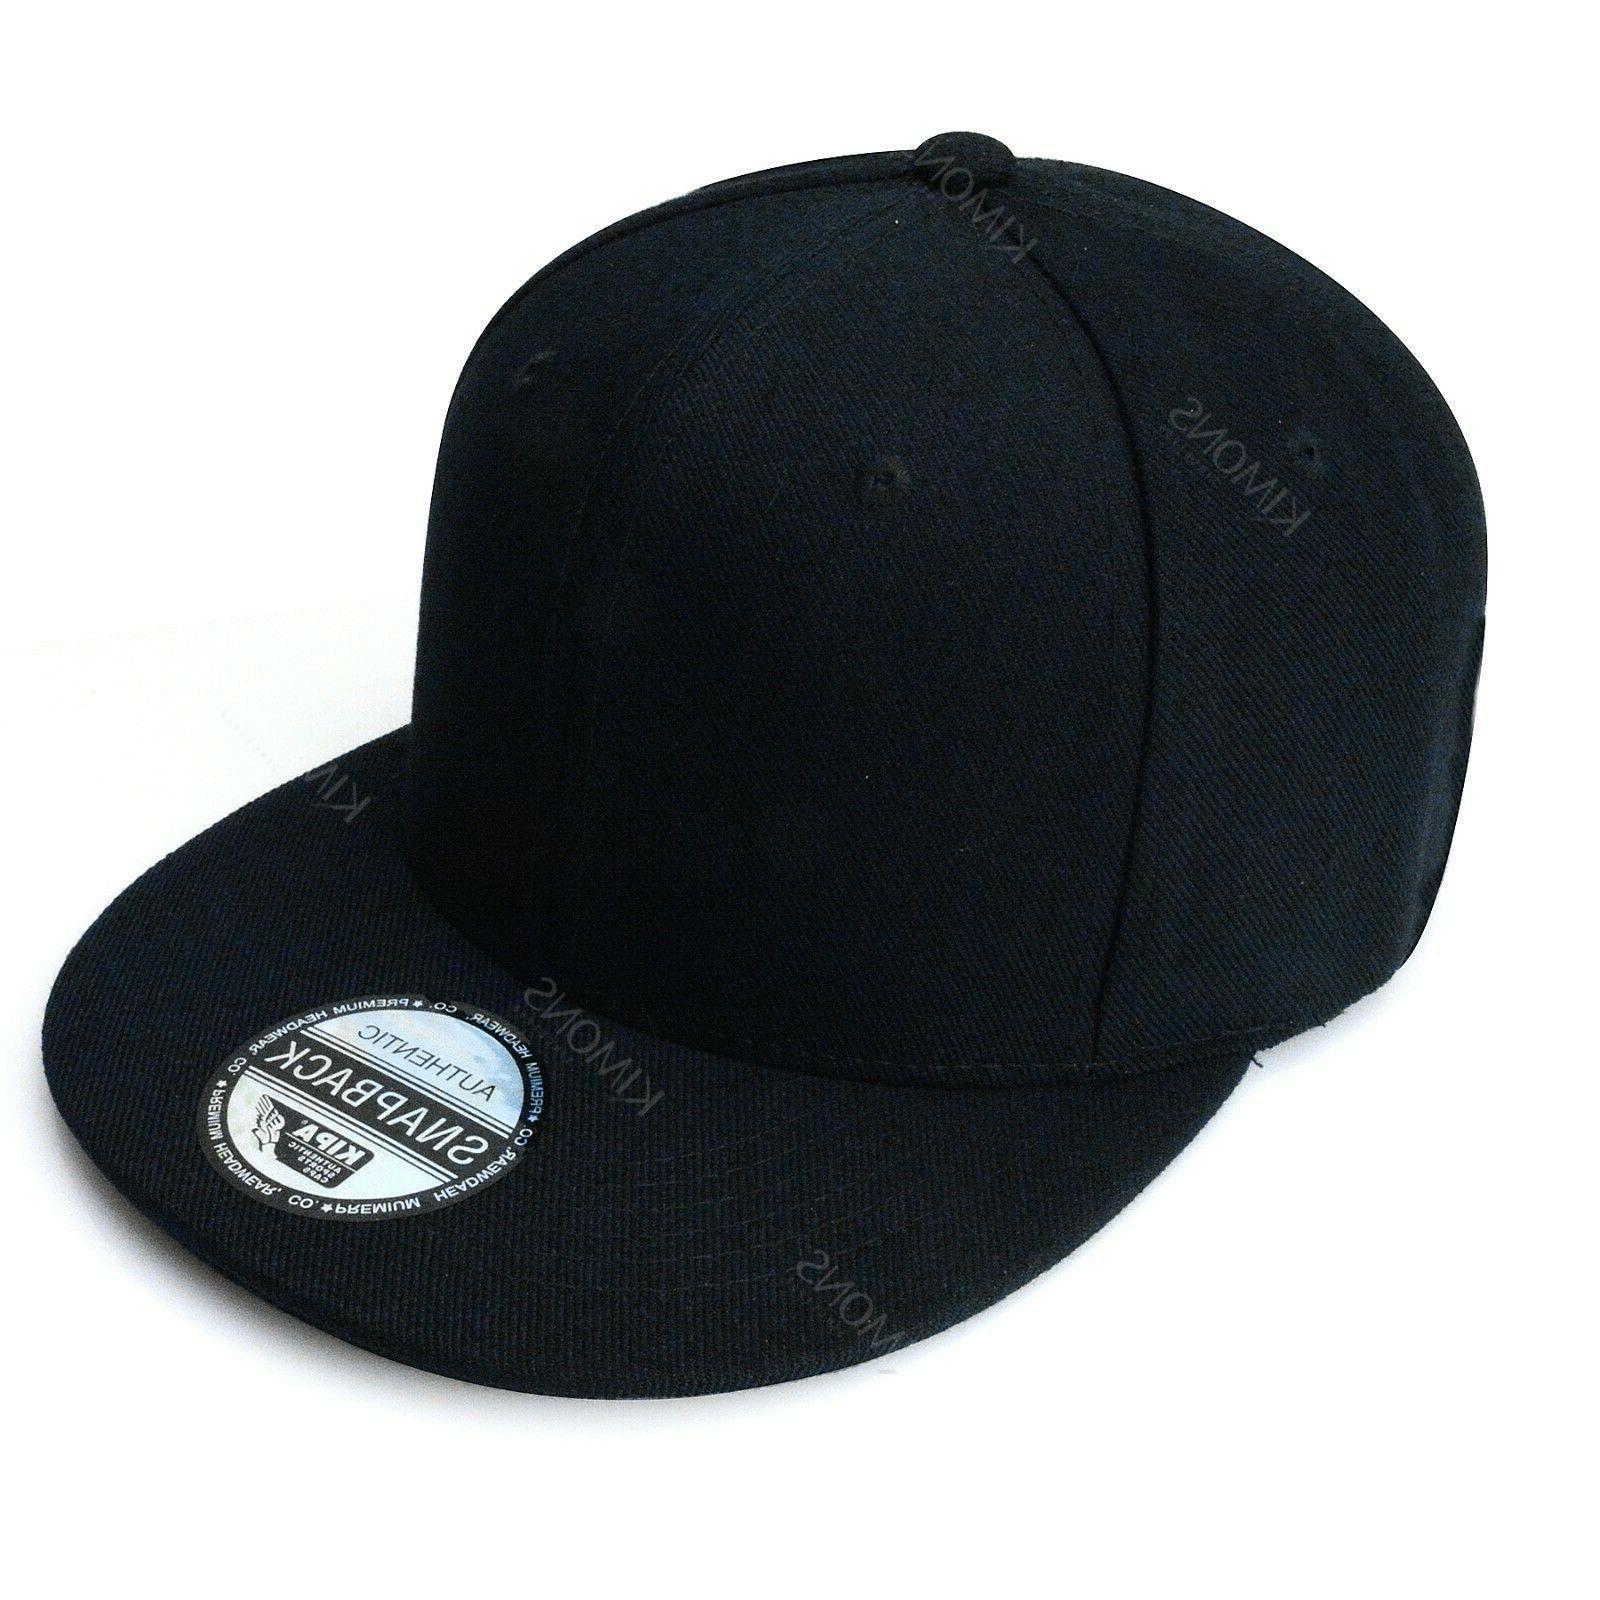 Snapback Hat Flat Cap Trucker